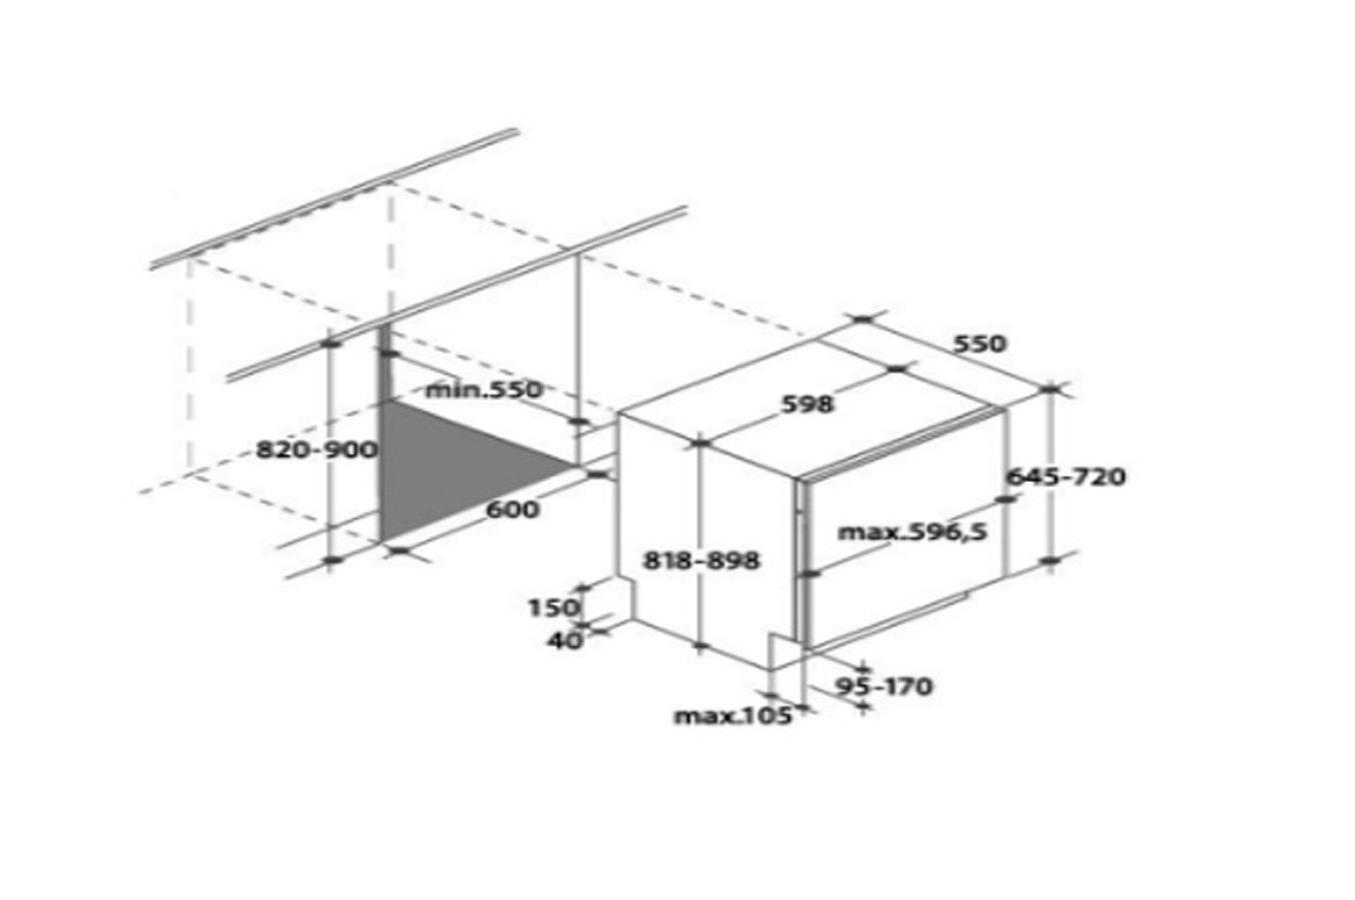 lave vaisselle encastrable candy cdi 6015 simply fi. Black Bedroom Furniture Sets. Home Design Ideas